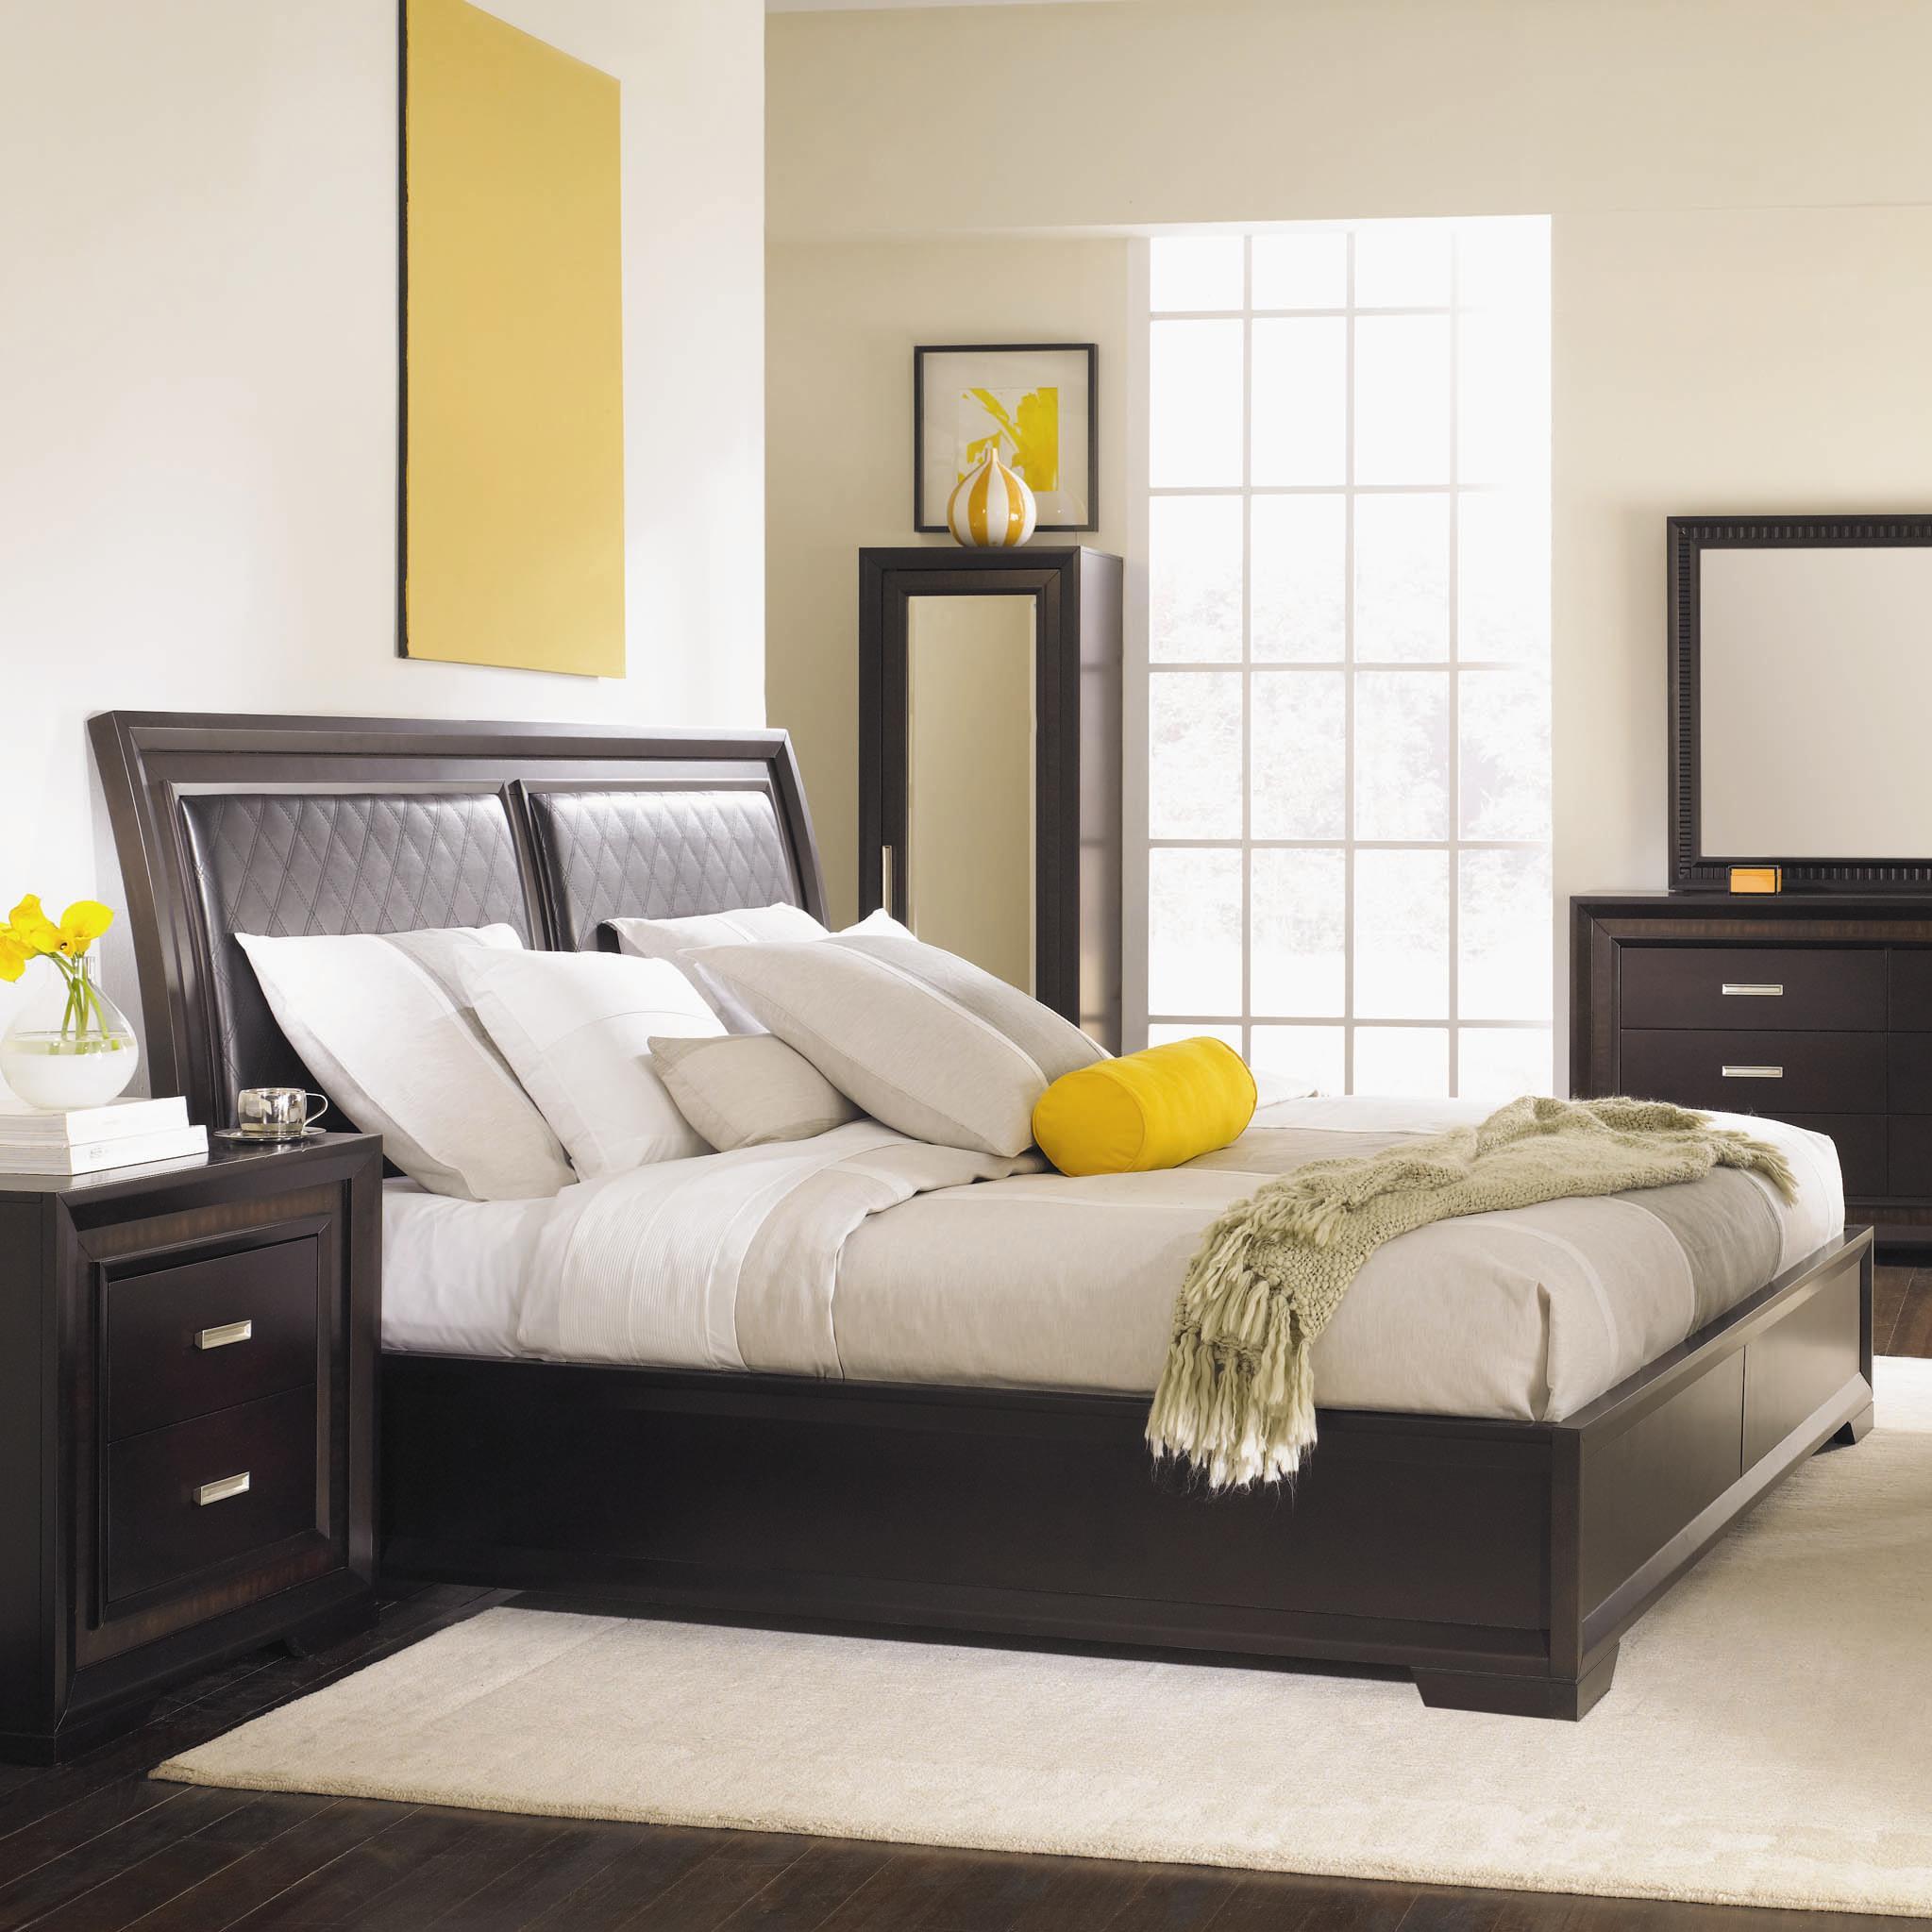 Najarian Brentwood Queen Bed - Item Number: BDBREHBQM+BDBREFBQM+BDBRERSKEQM